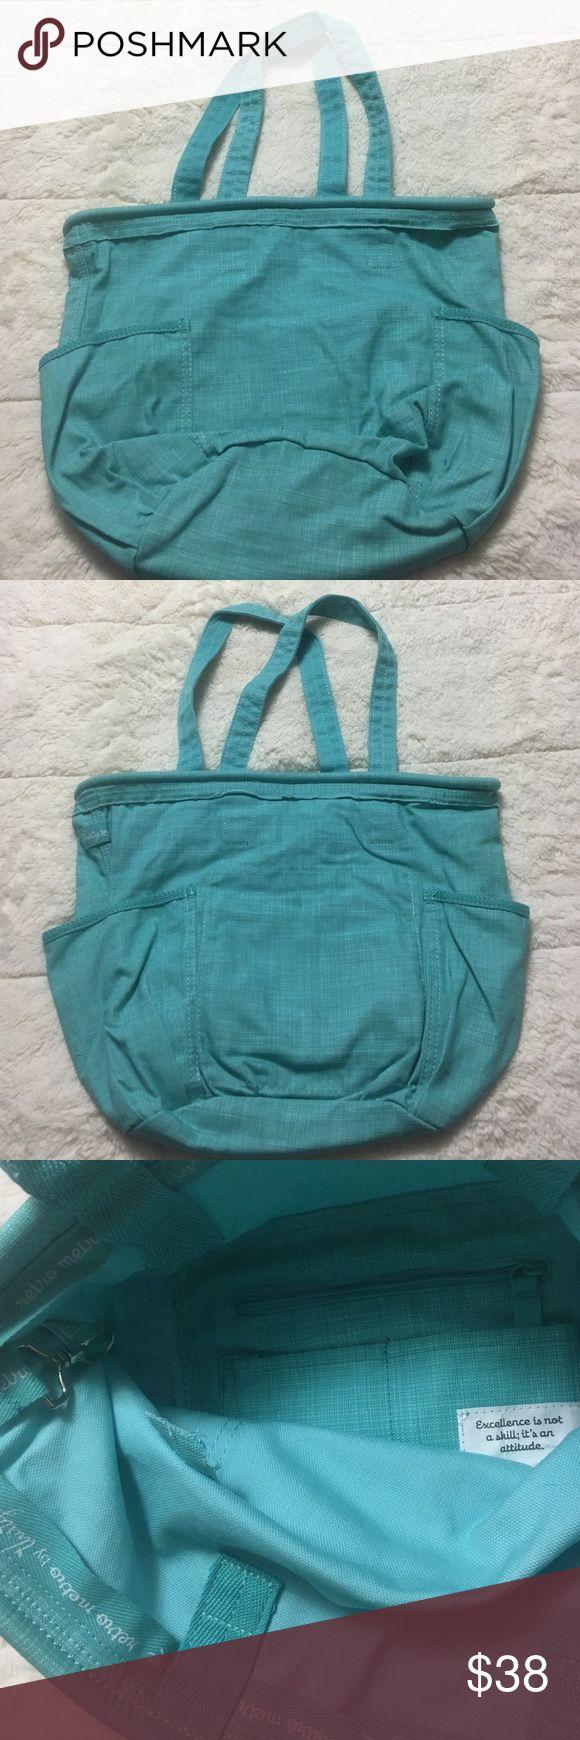 Retro Metro Bag Thirty-One Retro Metro Bag. New without tags. Thirty-One Bags